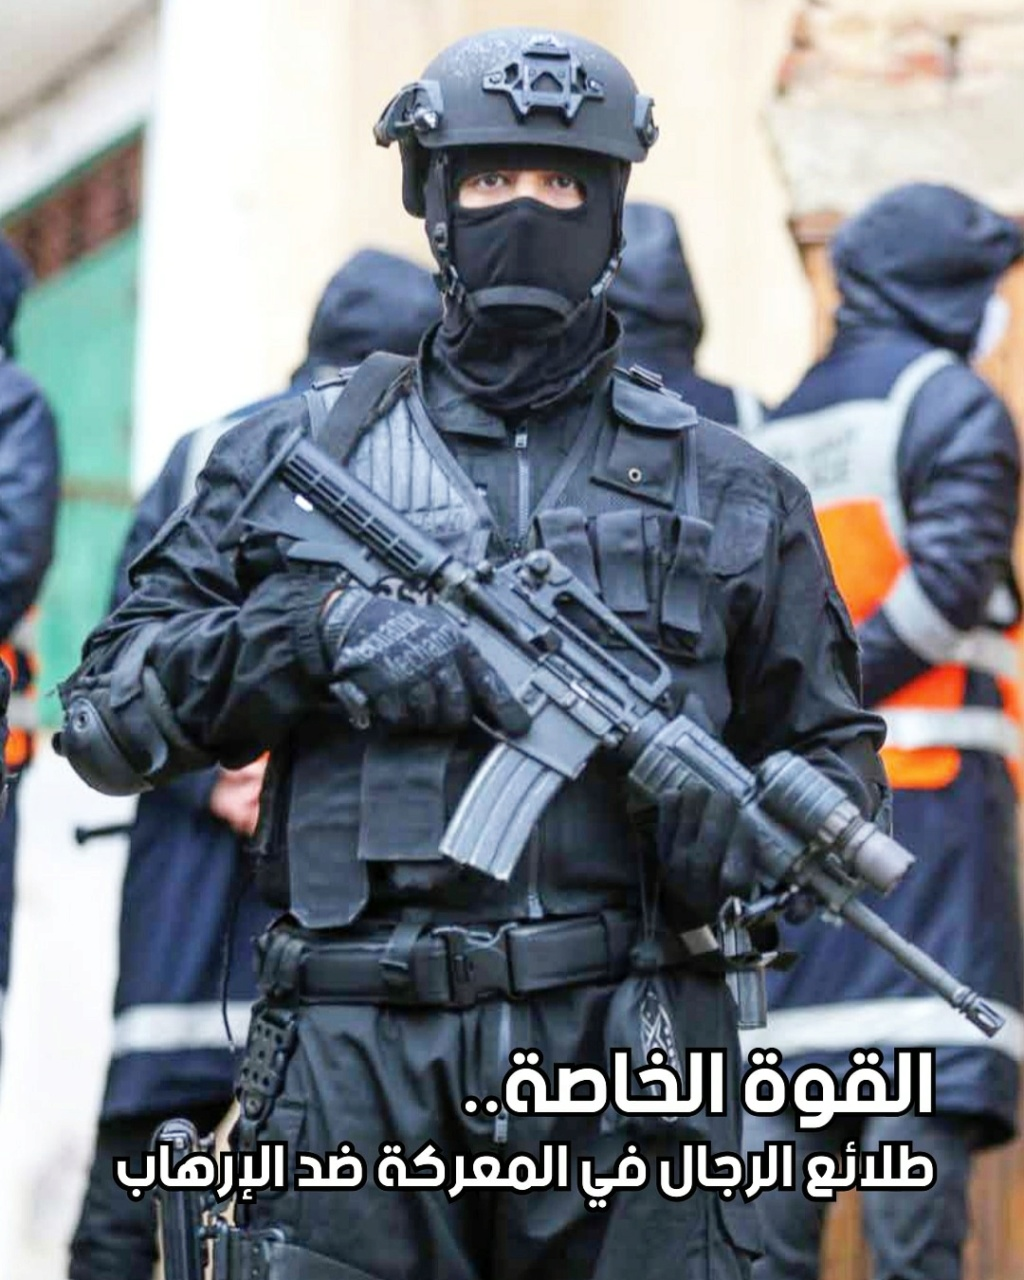 BCIJ (Bureau Central d'Investigations Judiciaires) .... FBI Marocain - Page 25 Img_2108